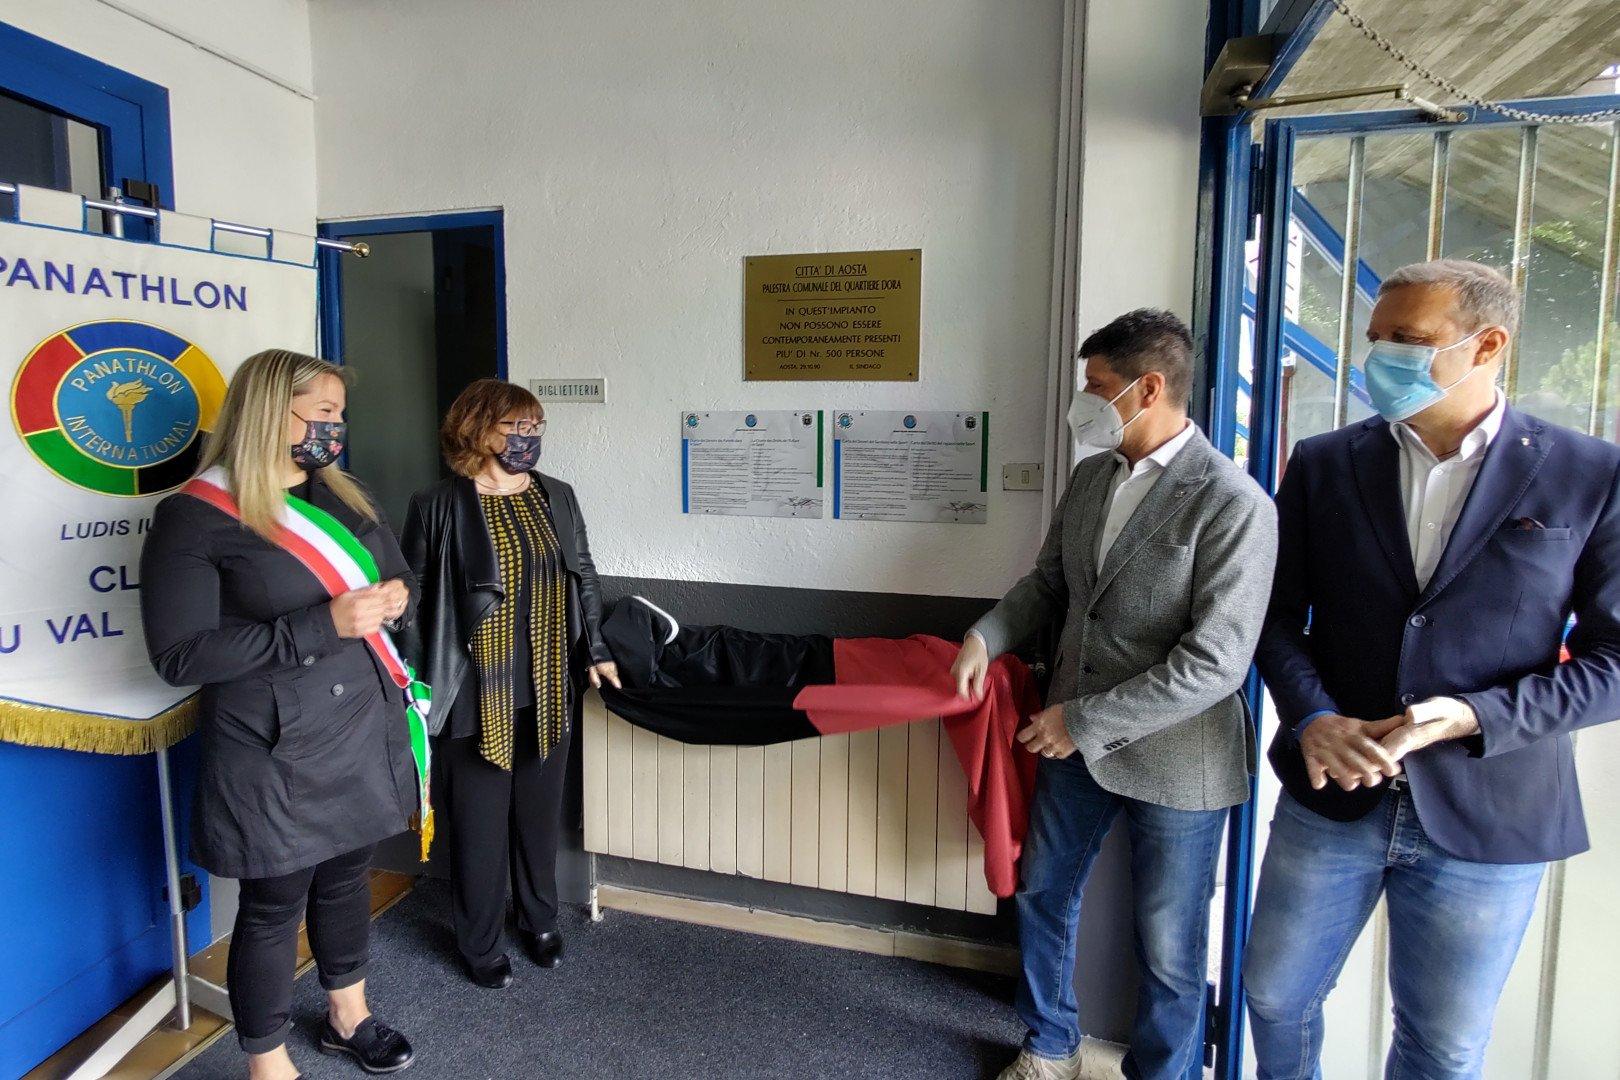 Josette Borre ed Alina Sapinet con Piercarlo Lunardi e Jean Dondeynaz